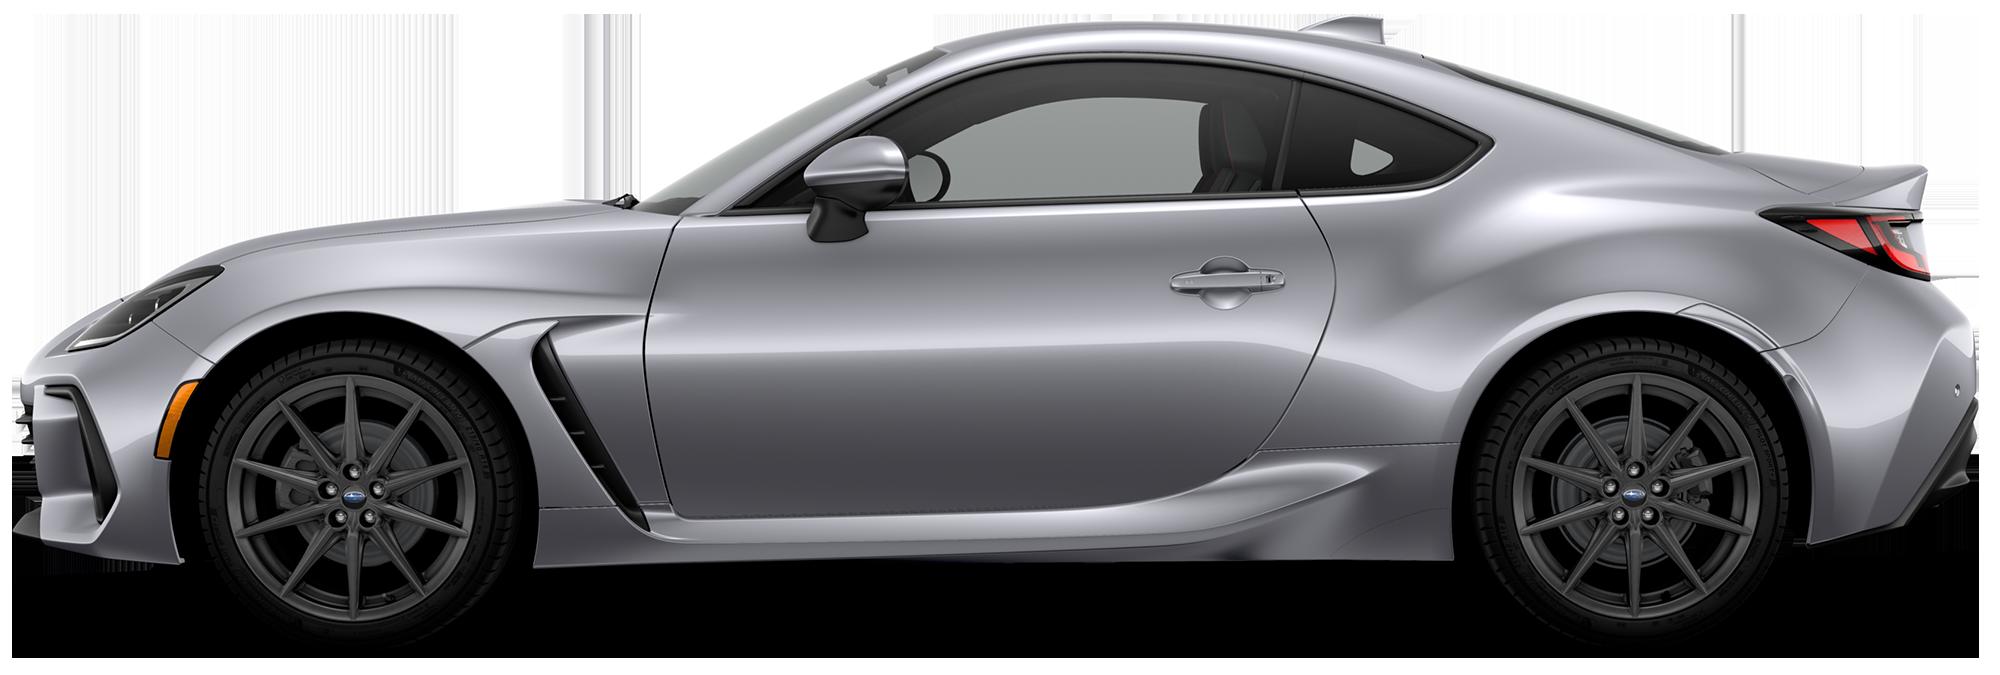 2022 Subaru BRZ Coupe Limited